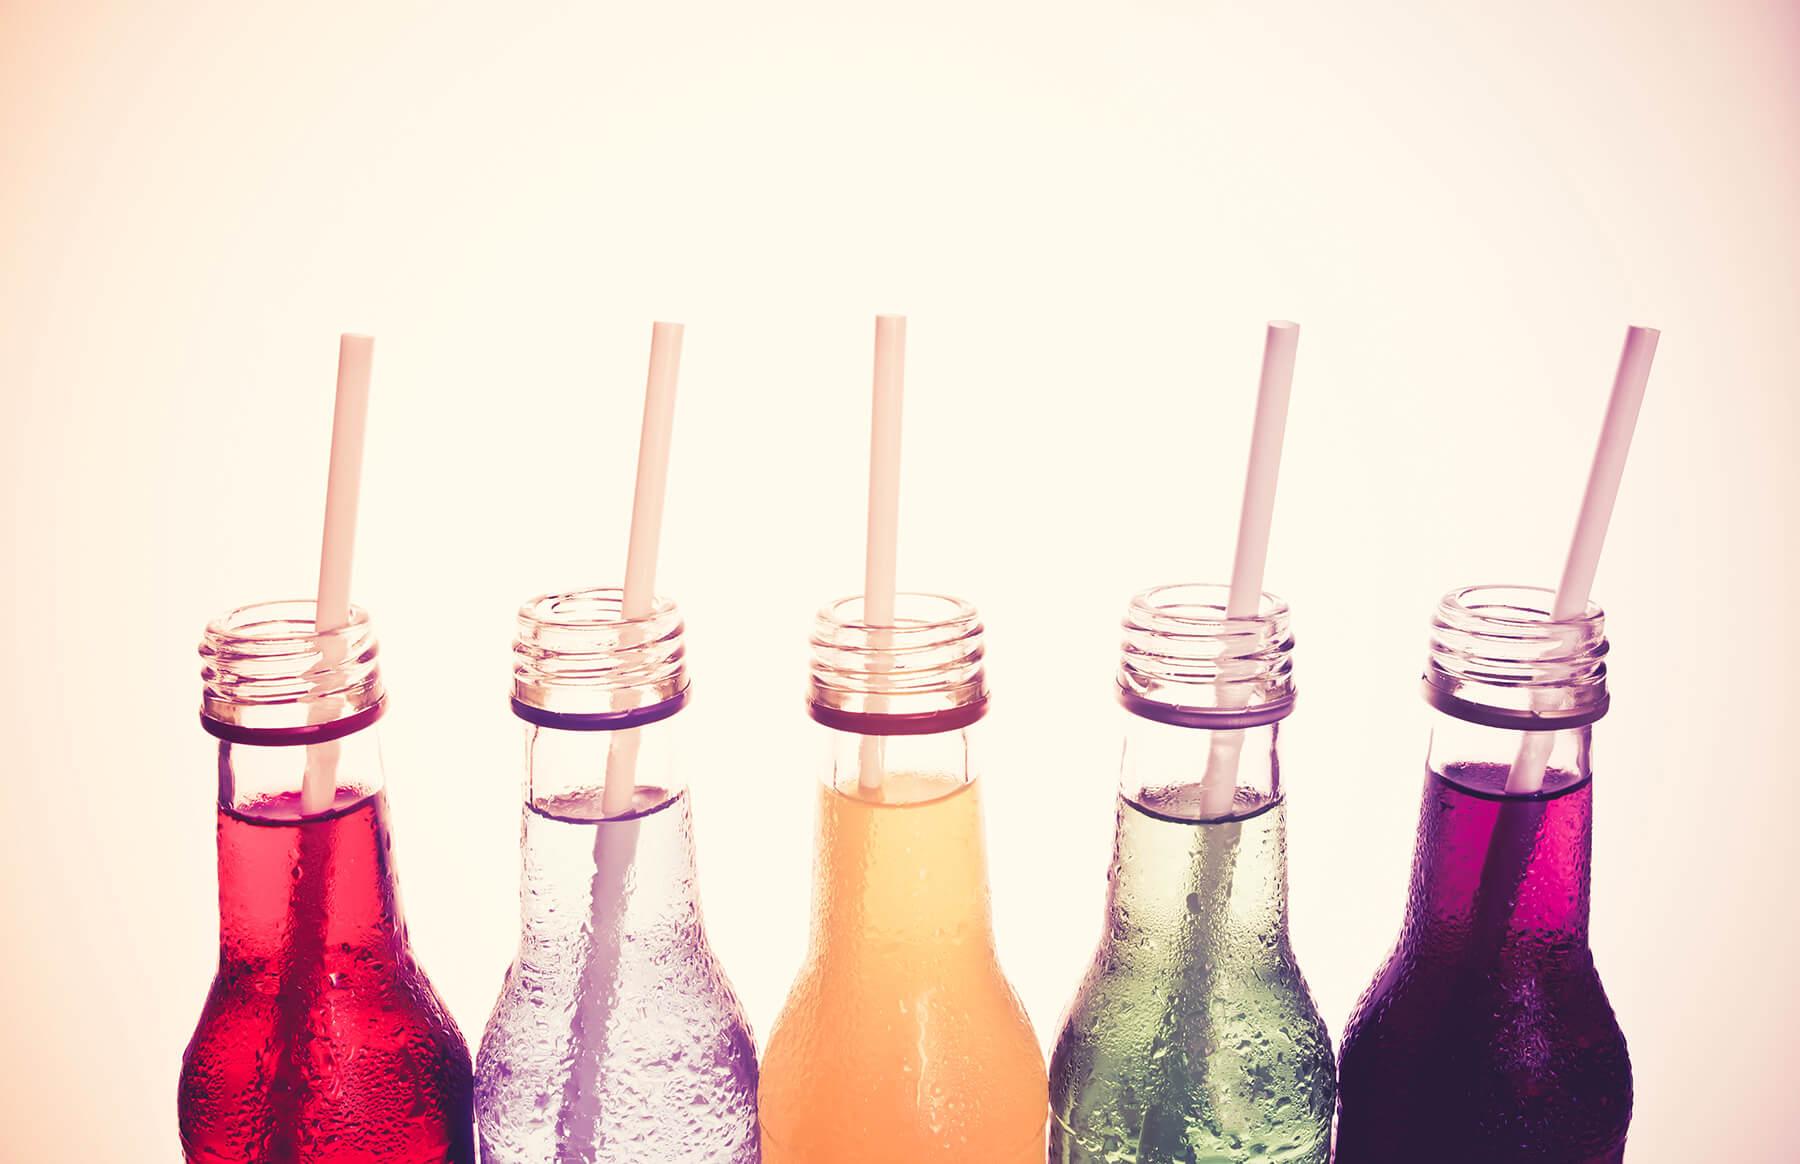 Cabana Soft Drinks Essex - Sugar Tax